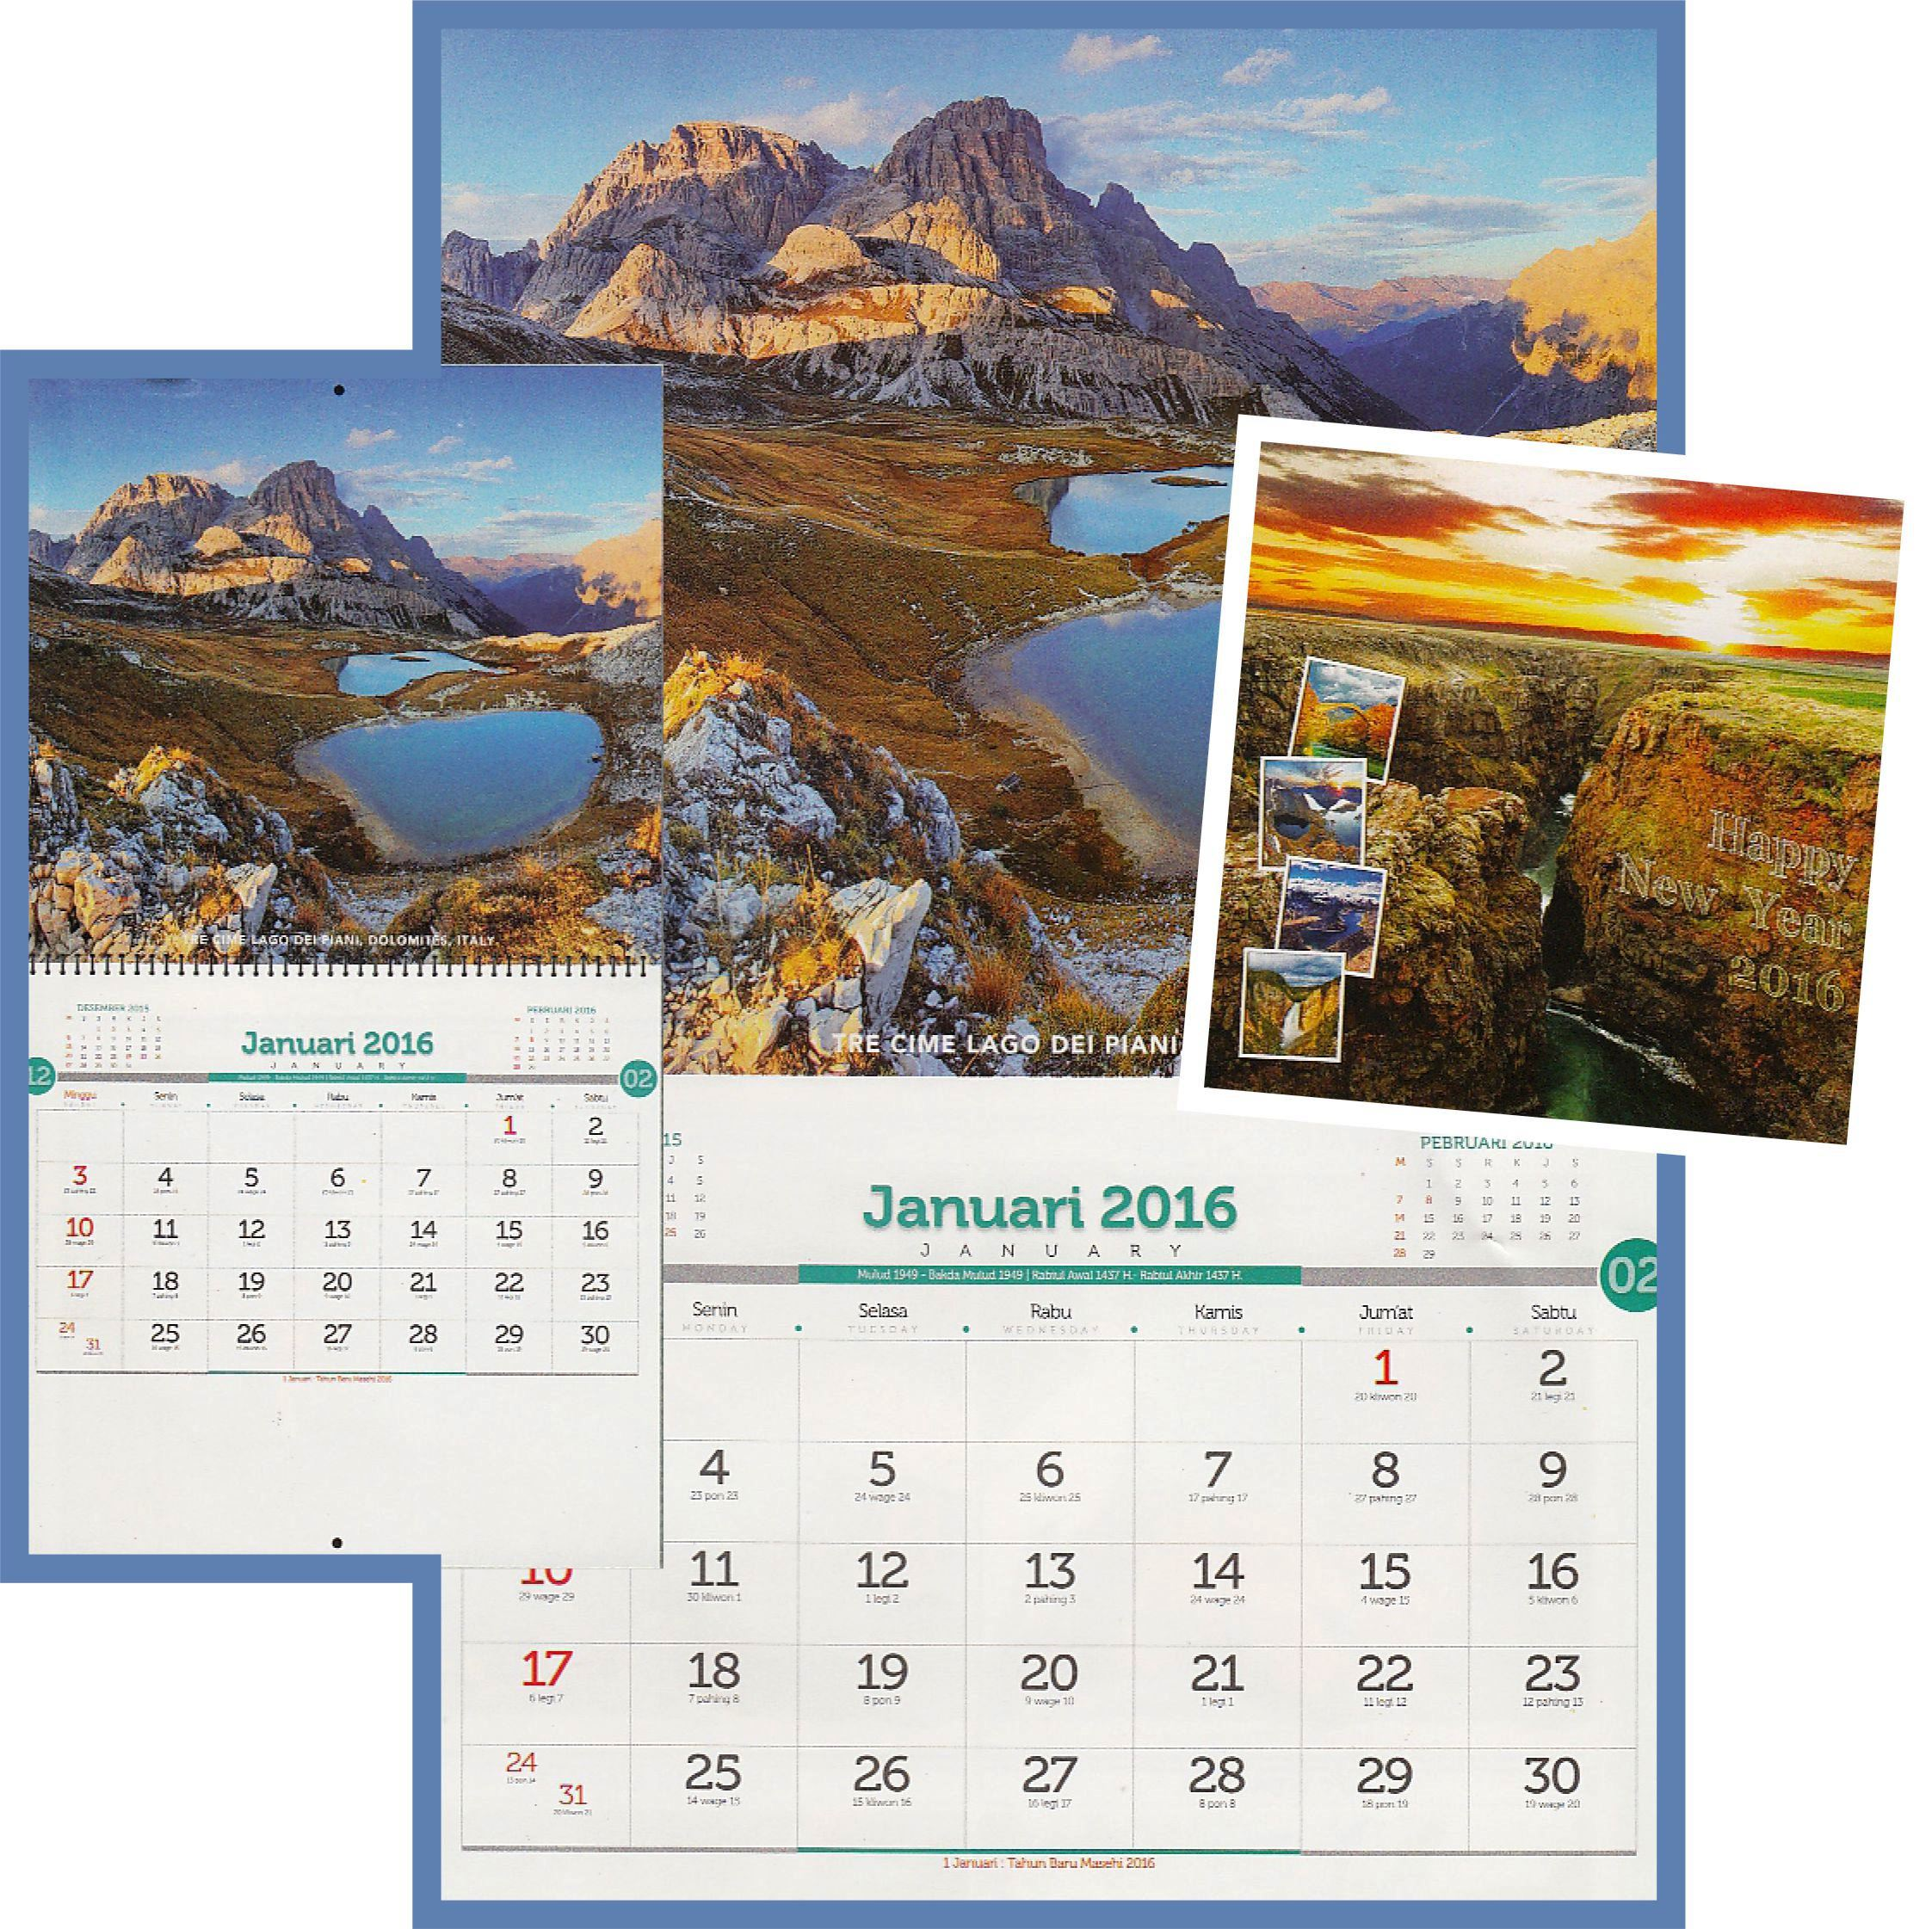 Desain Kalender 2016 Indahnya Dunia - Ayuprint.co.id